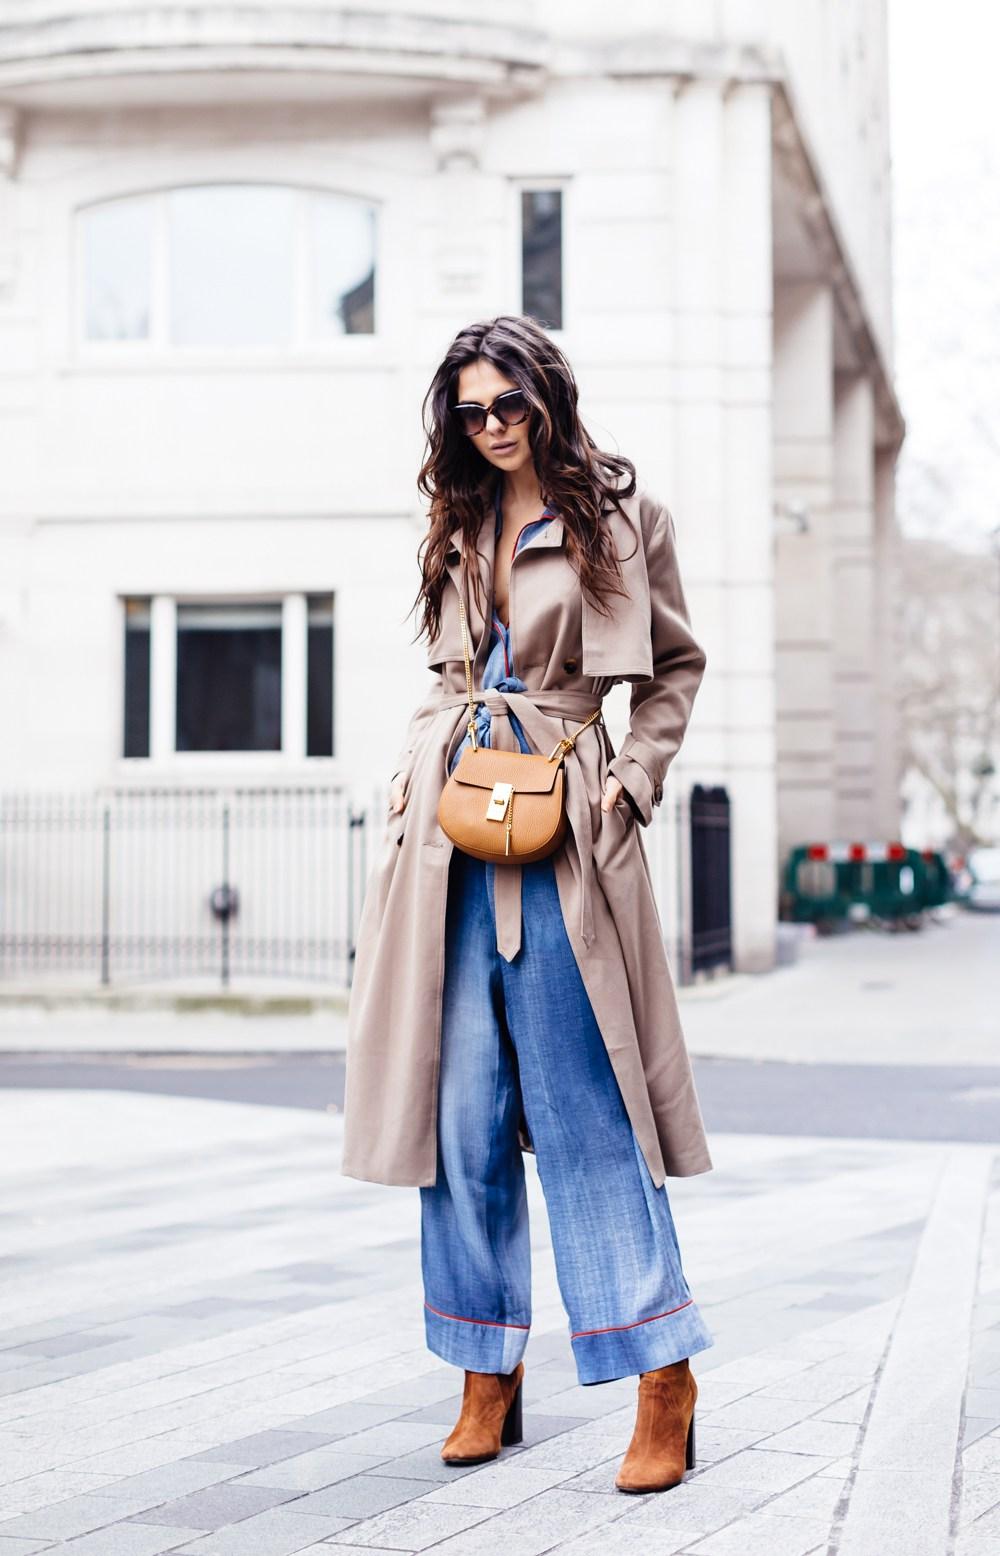 doina-ciobanu-curly-hair-zara-boots-fendi-jumpsuit-london-7.jpg